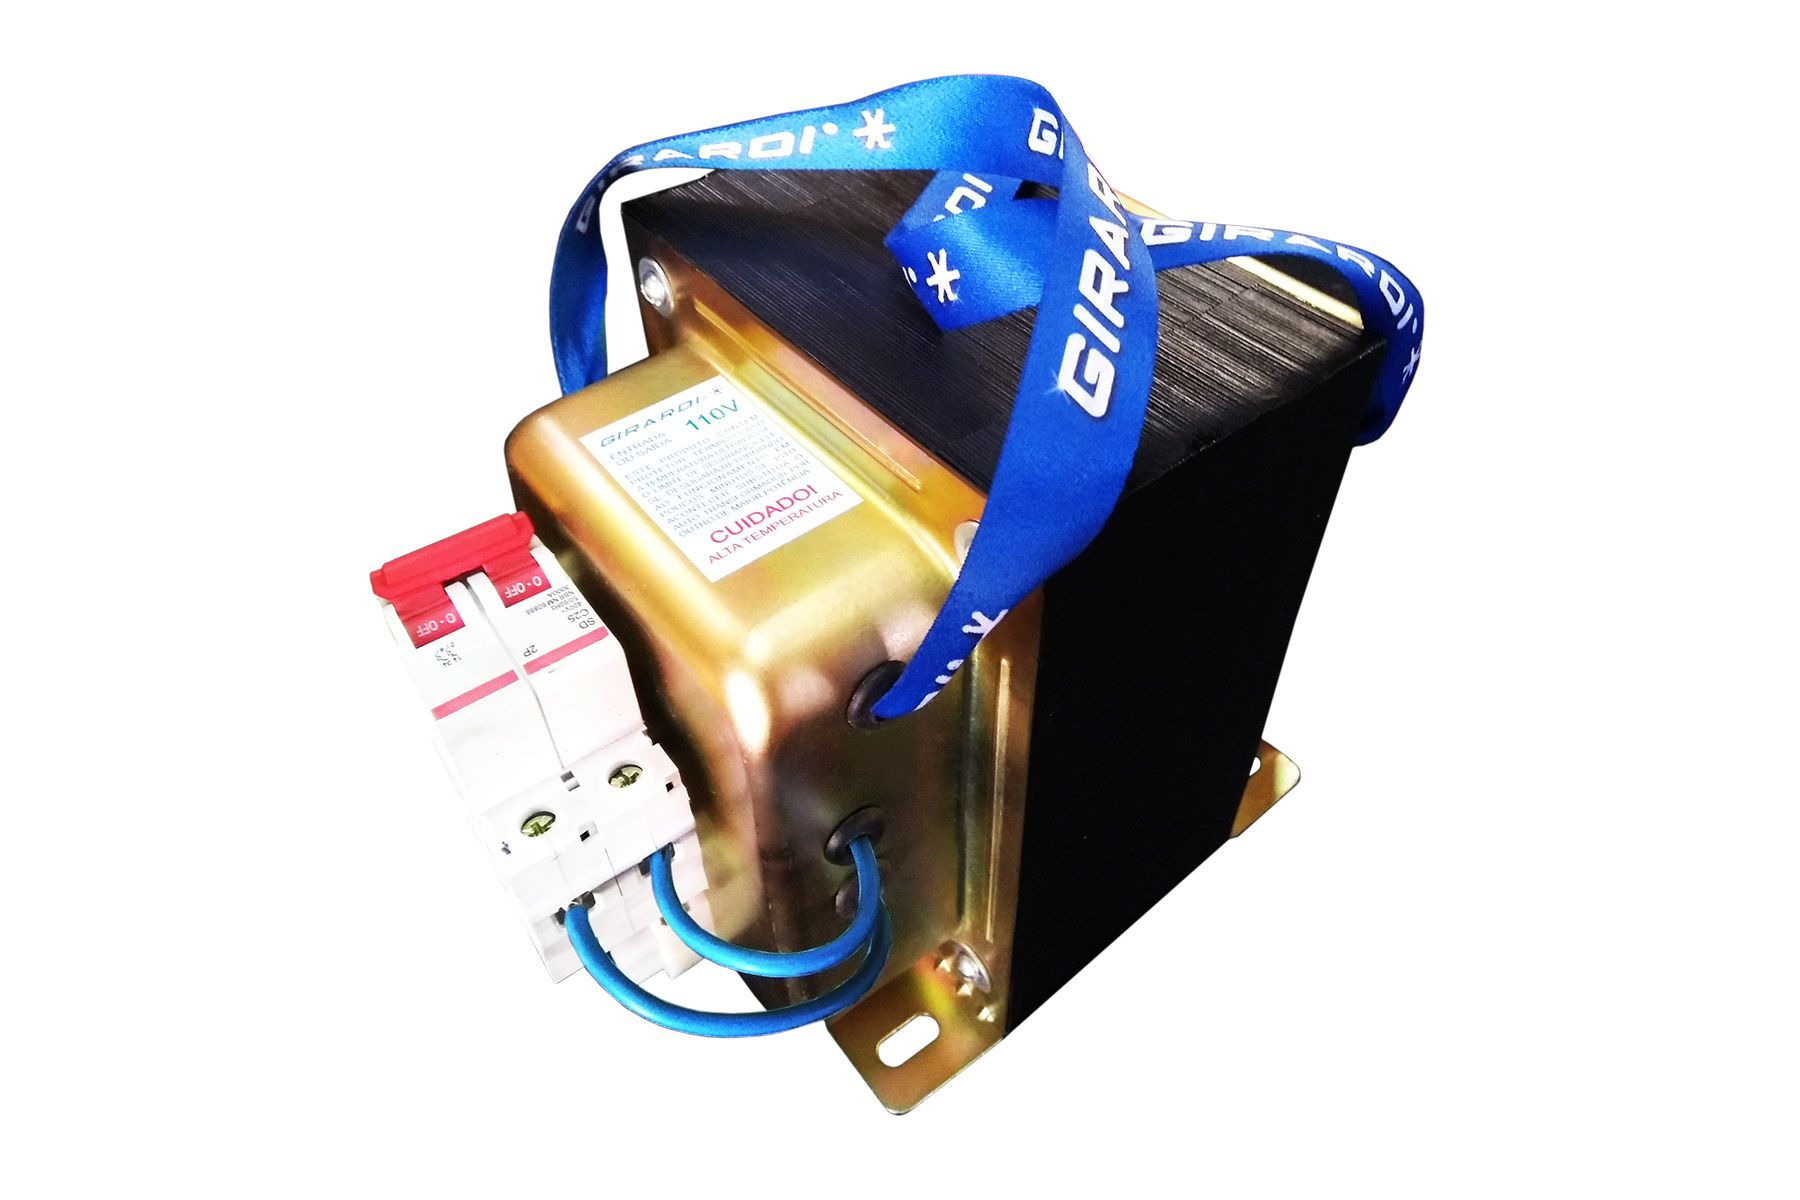 Autotransformador 7000 VA GIRARDI bivolt com Disjuntor de proteção